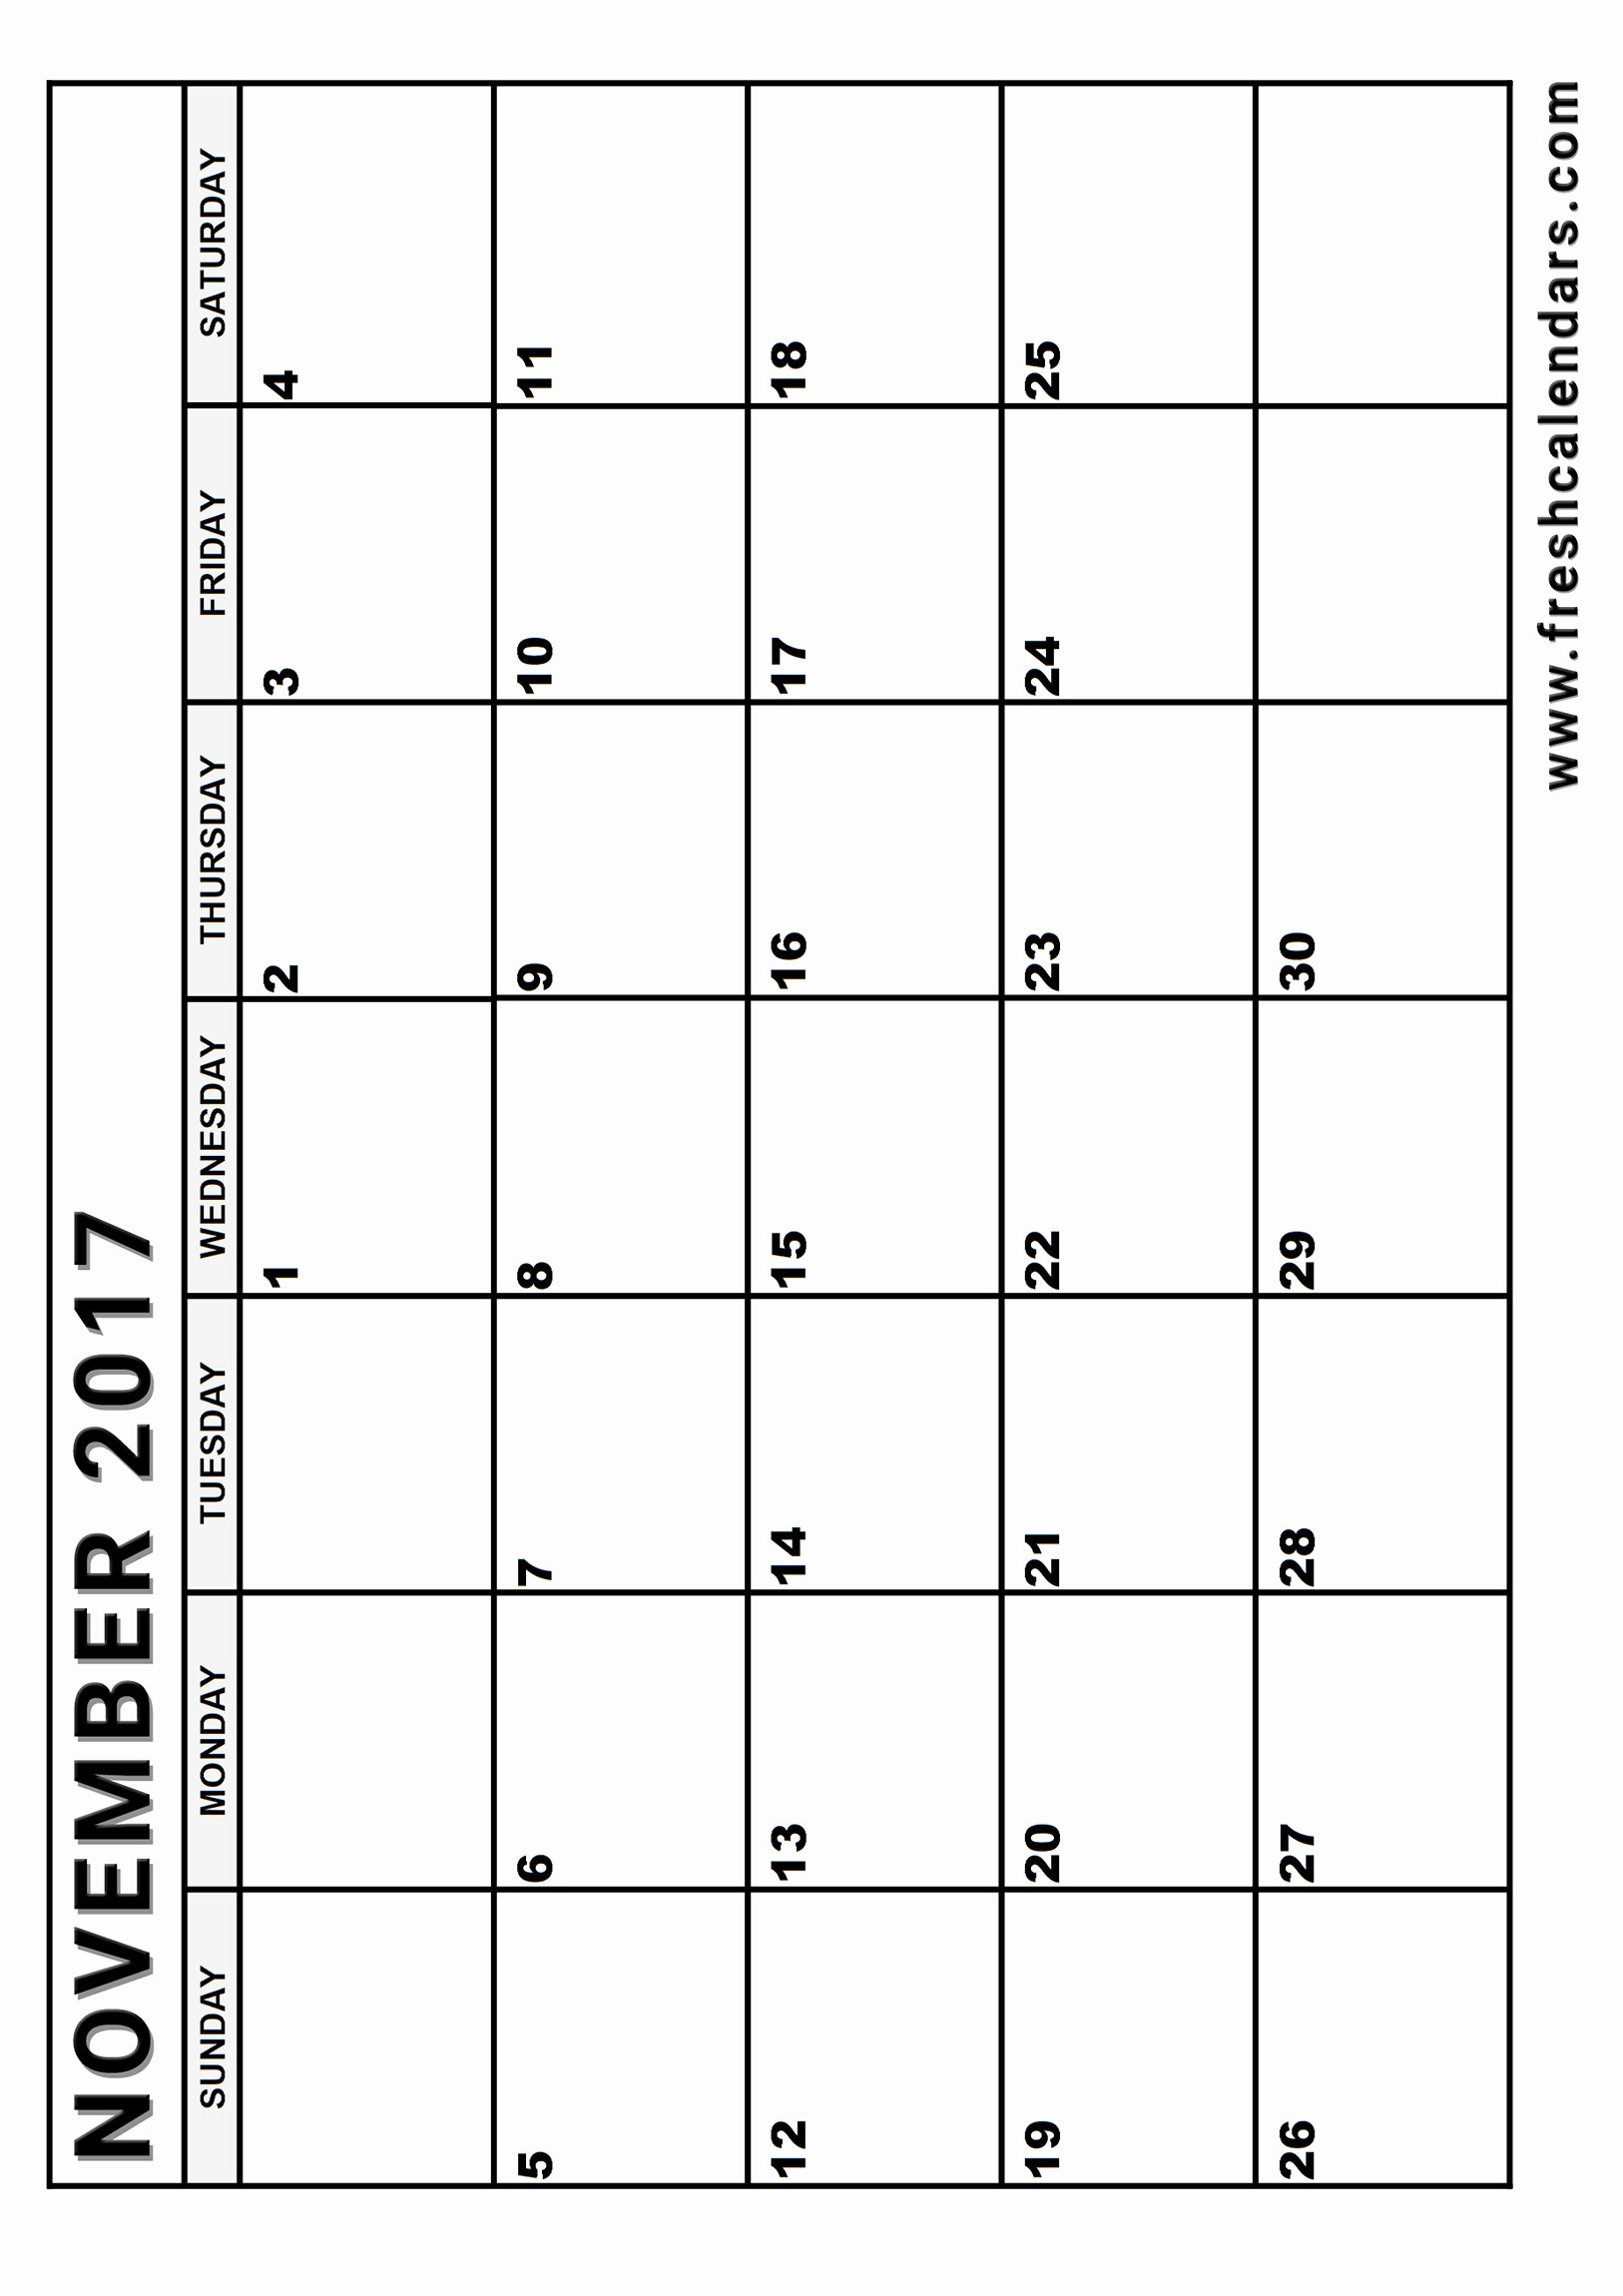 Blank November 2017 Calendar Template Fresh Blank November 2017 Calendar Printable Templates